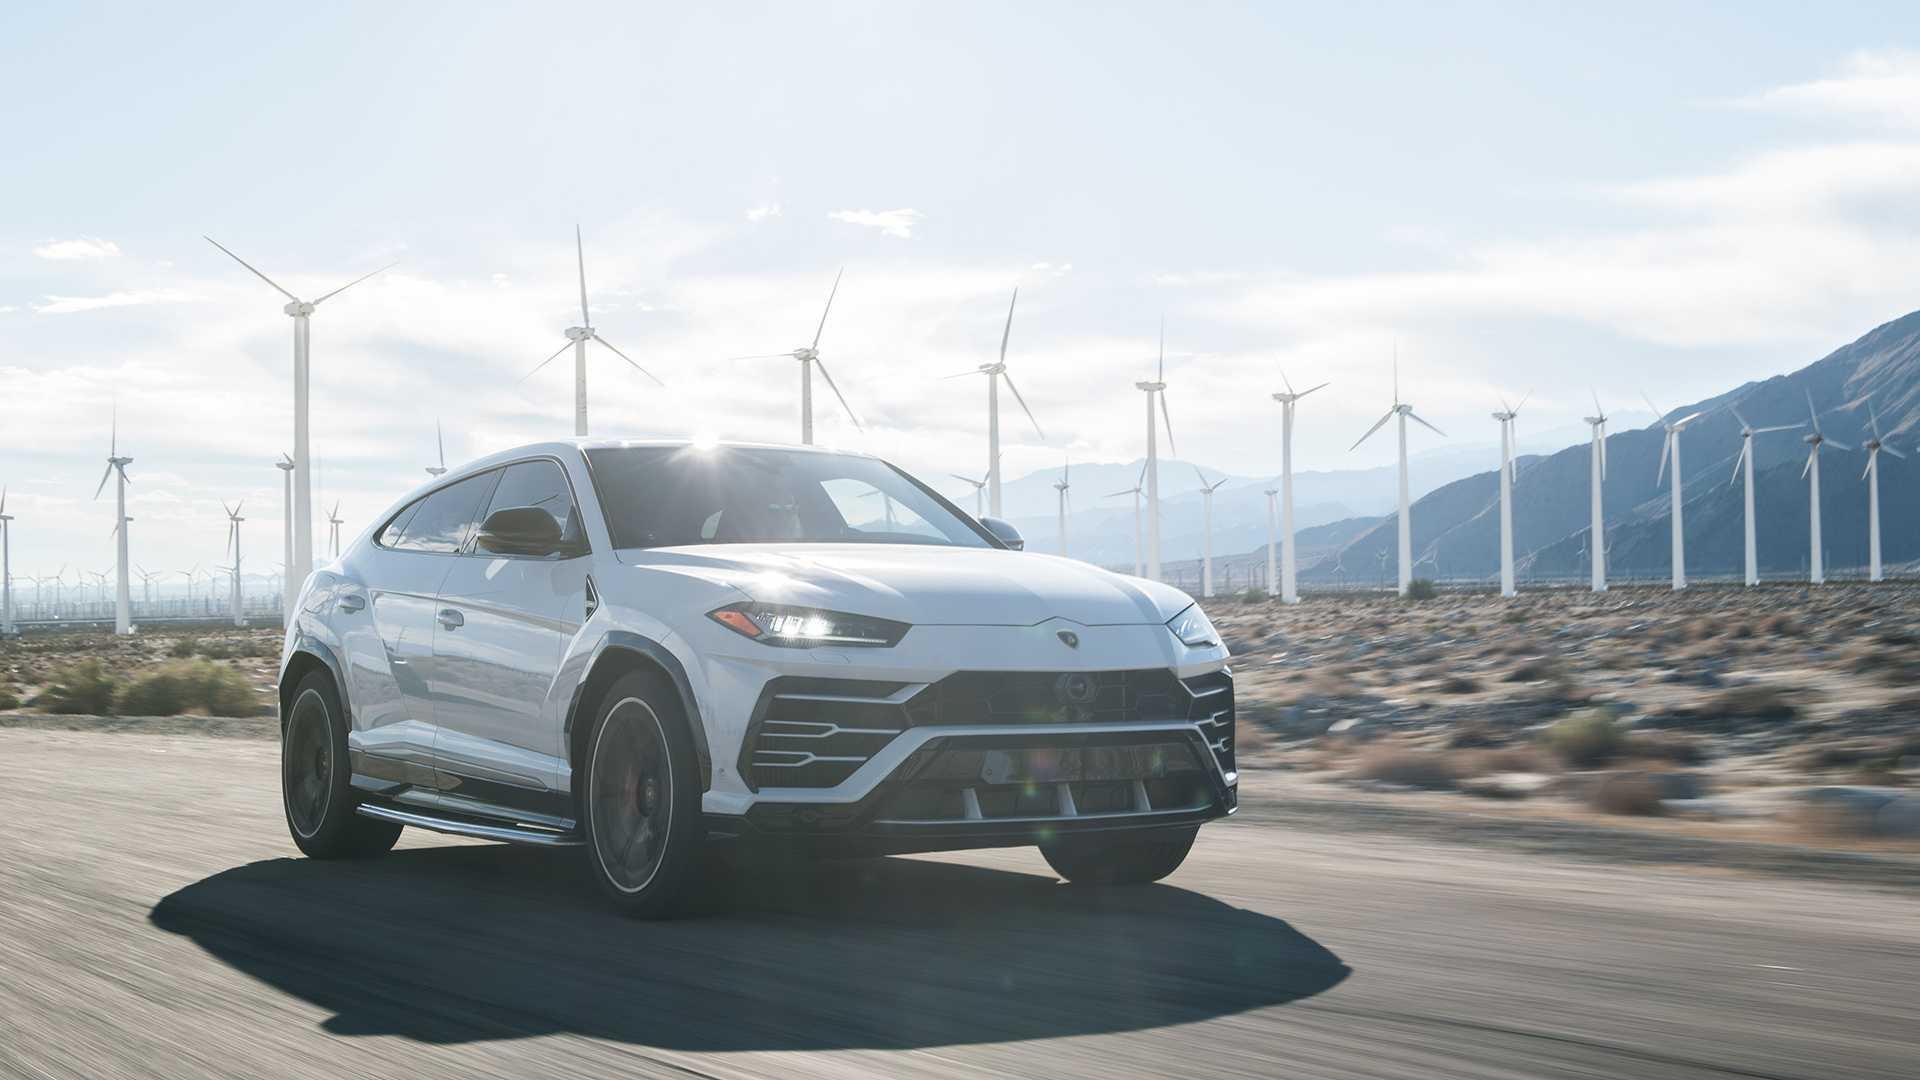 2019 Lamborghini Manage